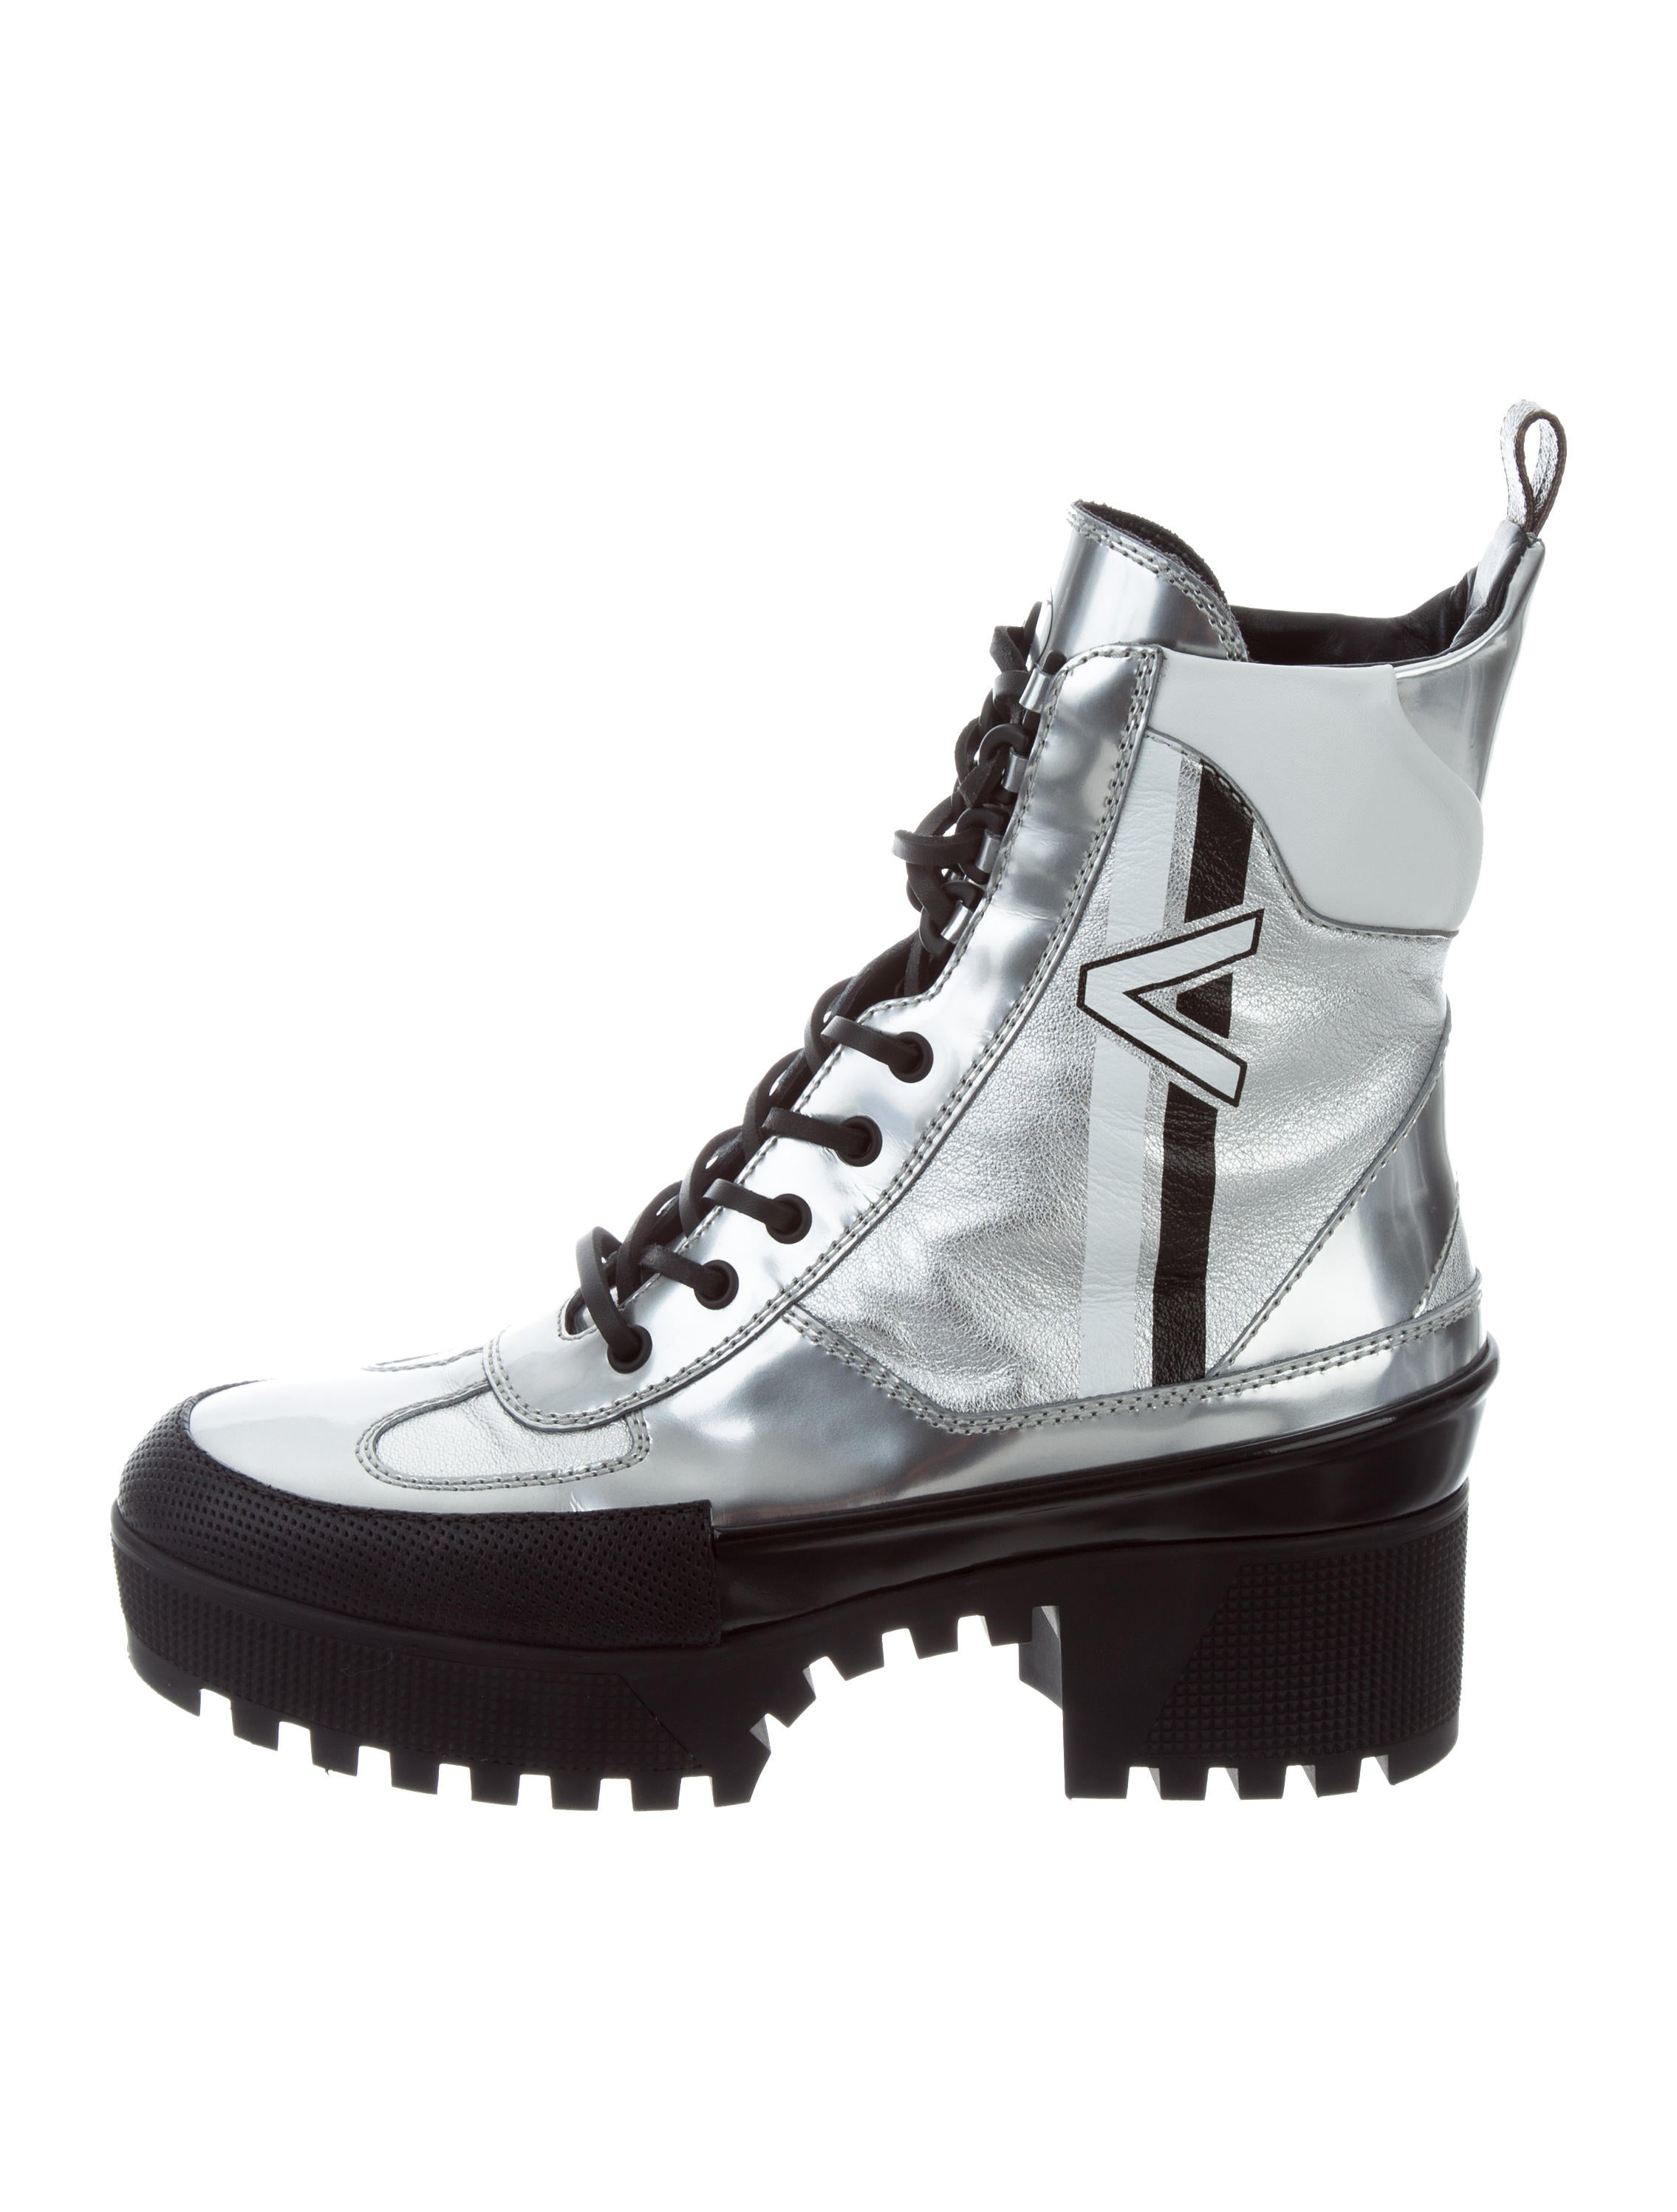 ebfe6671073b Louis Vuitton 2017 Spaceship Desert Boots - Shoes - LOU126977